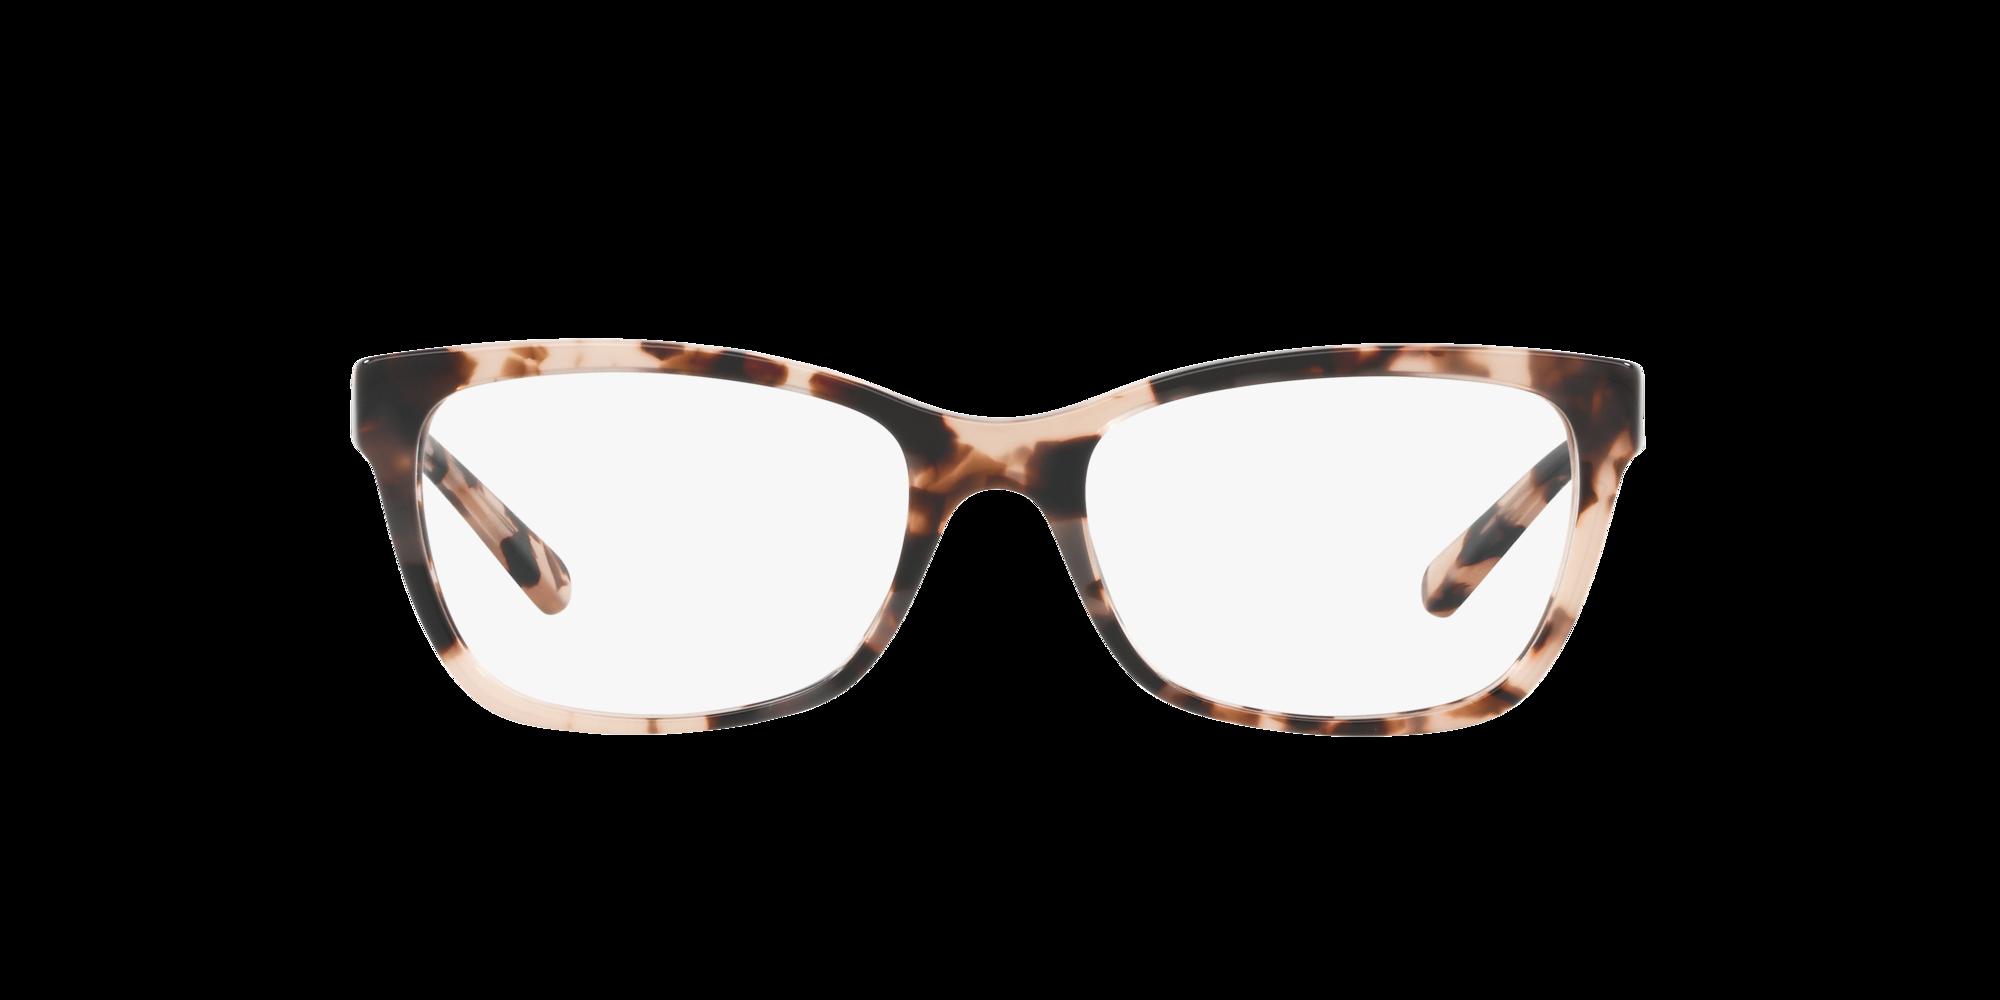 Image for MK4050 MARSEILLES from LensCrafters | Glasses, Prescription Glasses Online, Eyewear